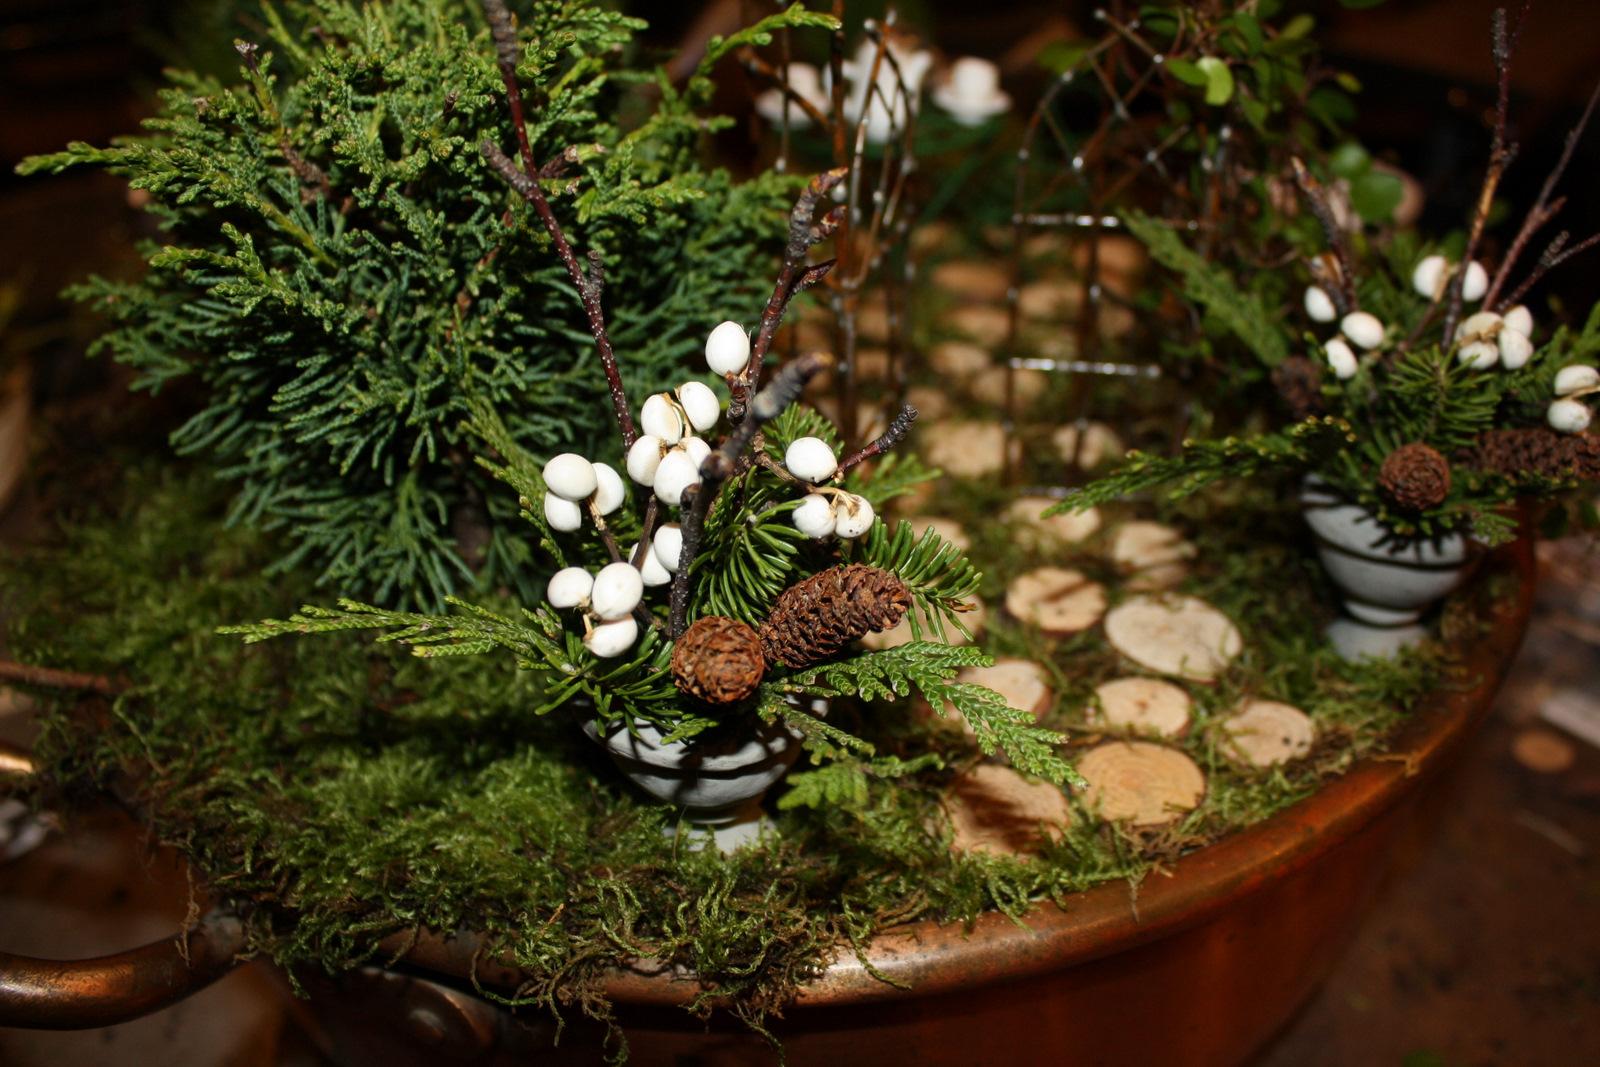 Buffalo Sisters Art Winter Tabletop Miniature Garden